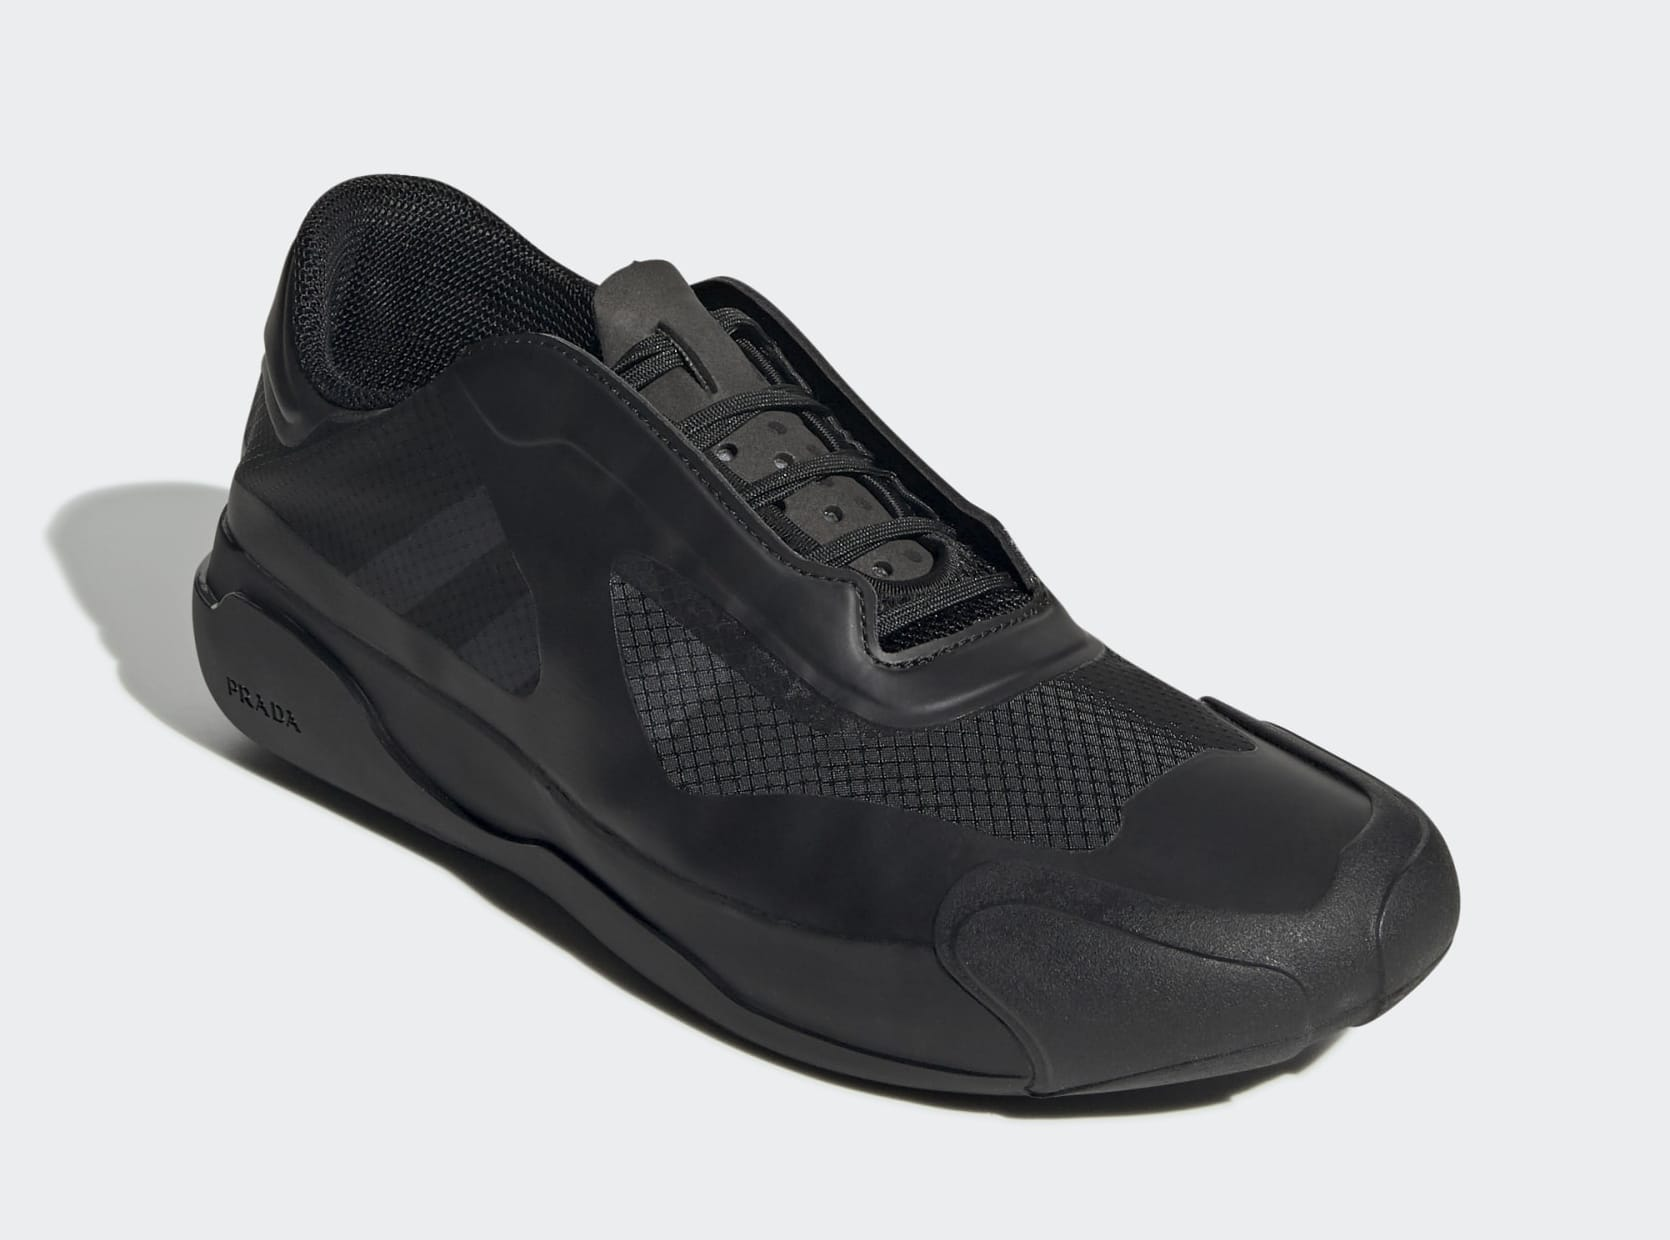 Prada x Adidas Luna Rossa 21 'Core Black' G57868 Avant